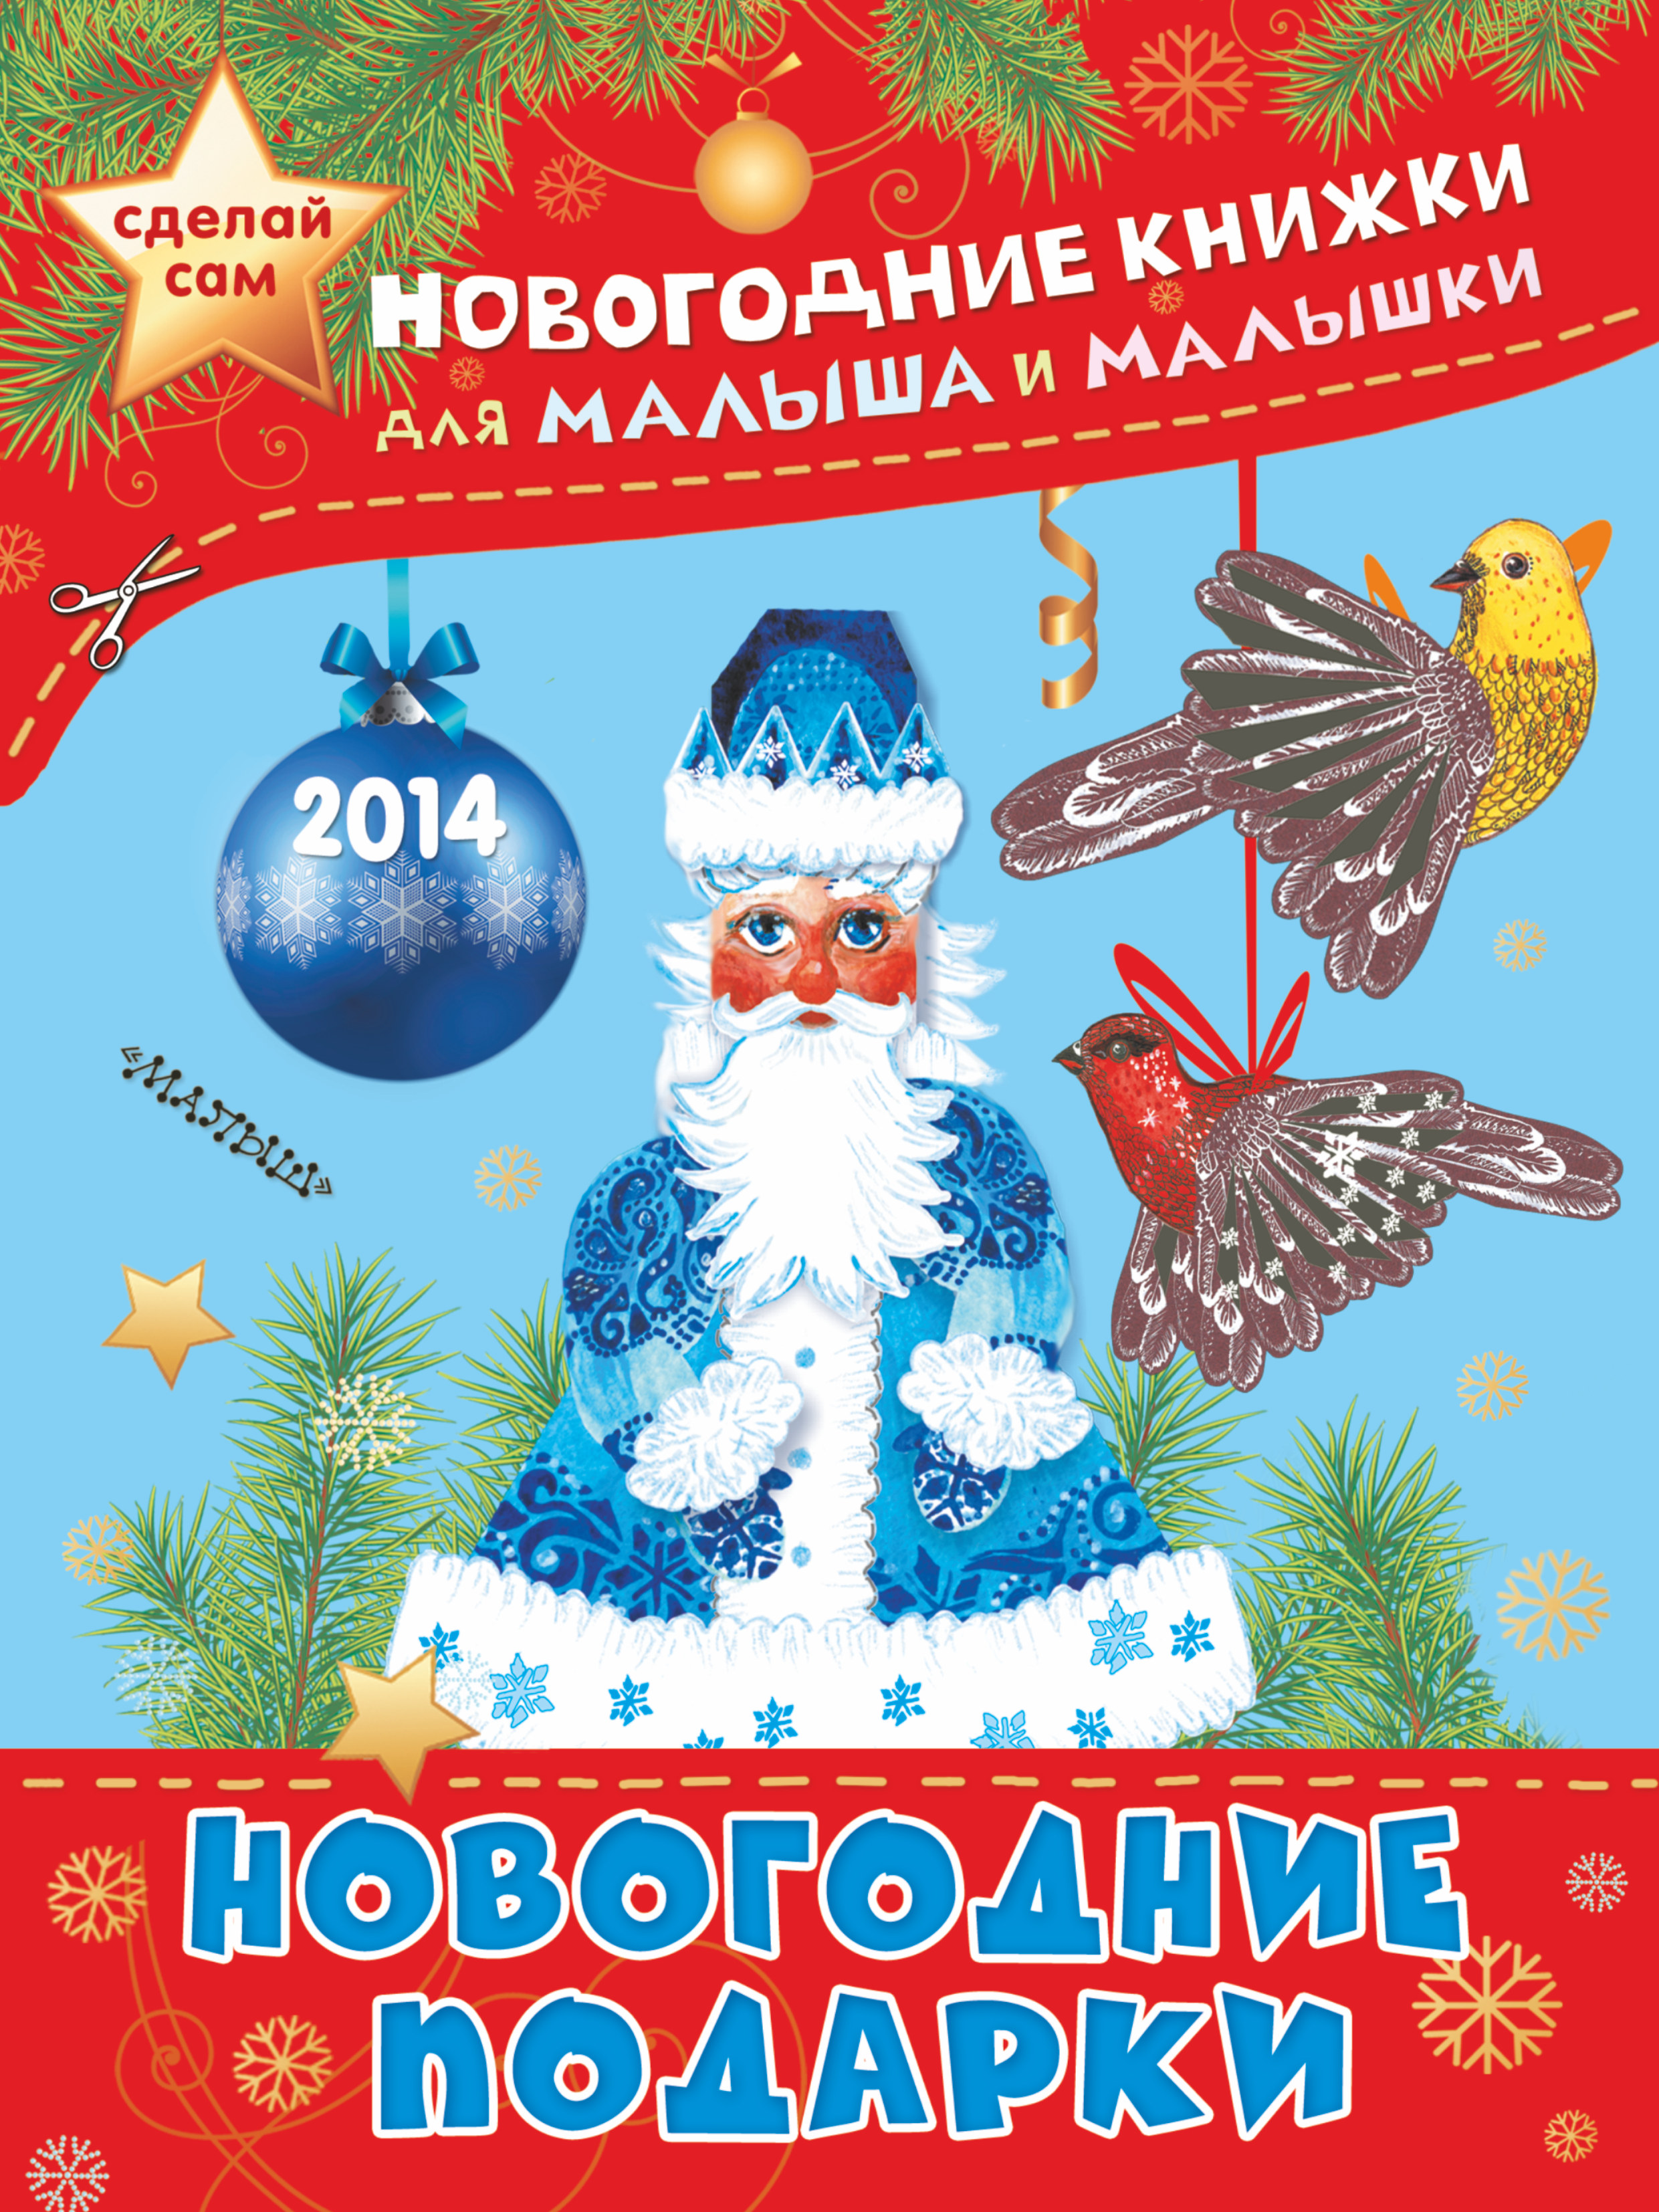 Гордеева Е.А. Рождественские игрушки игрушки для детей